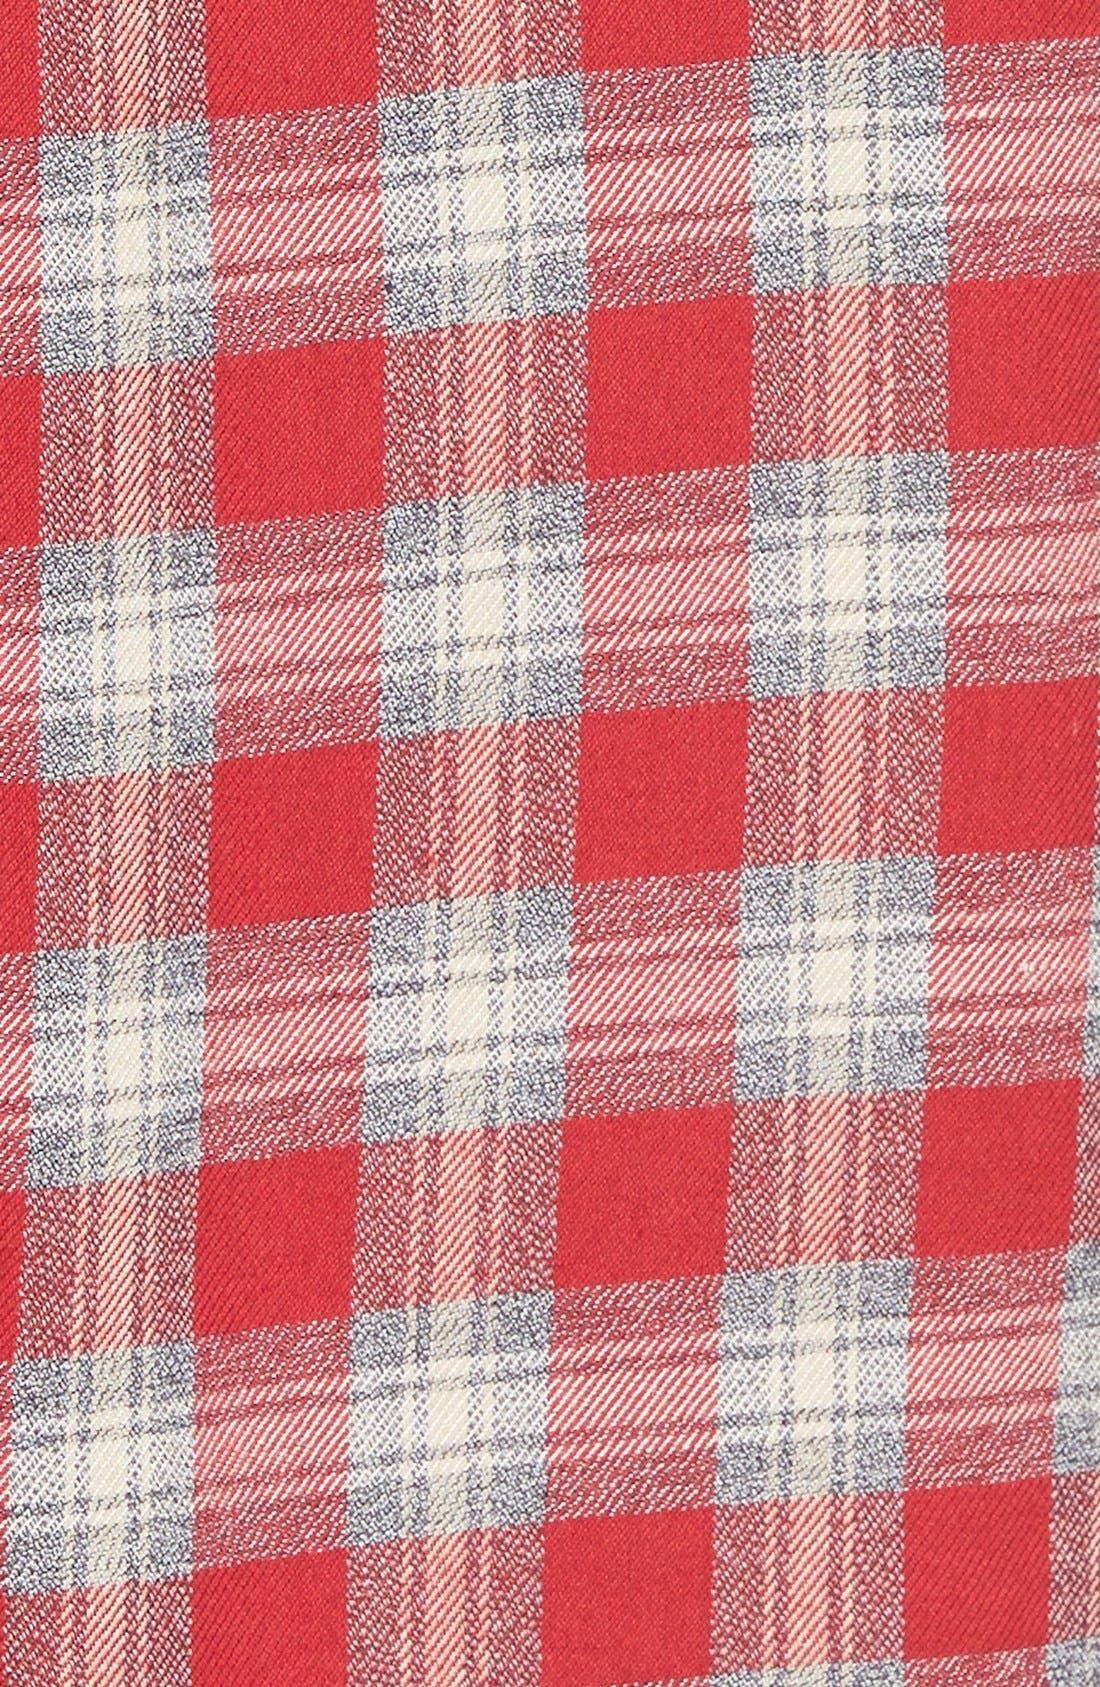 Alternate Image 4  - MadewellPlaid Shirtdress